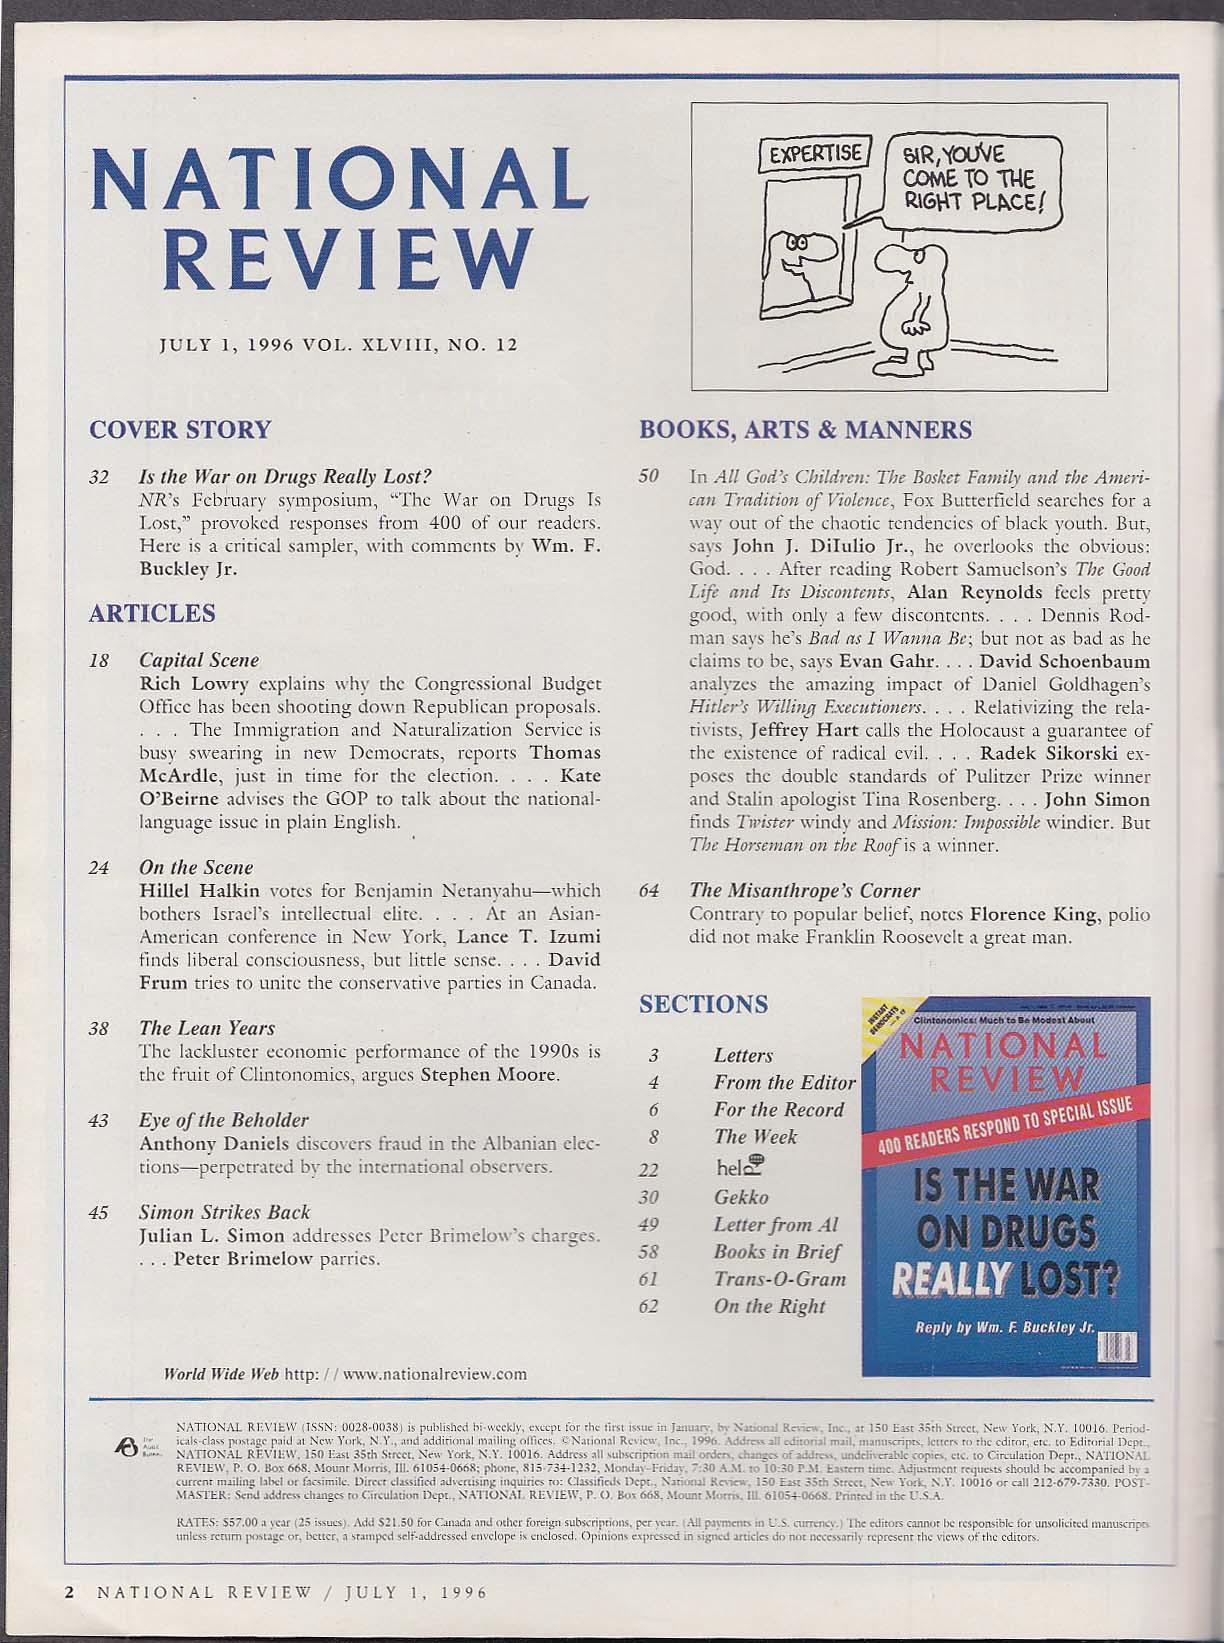 NATIONAL REVIEW William F Buckley Jr War on Drugs Clintonomics ++ 7/1 1996